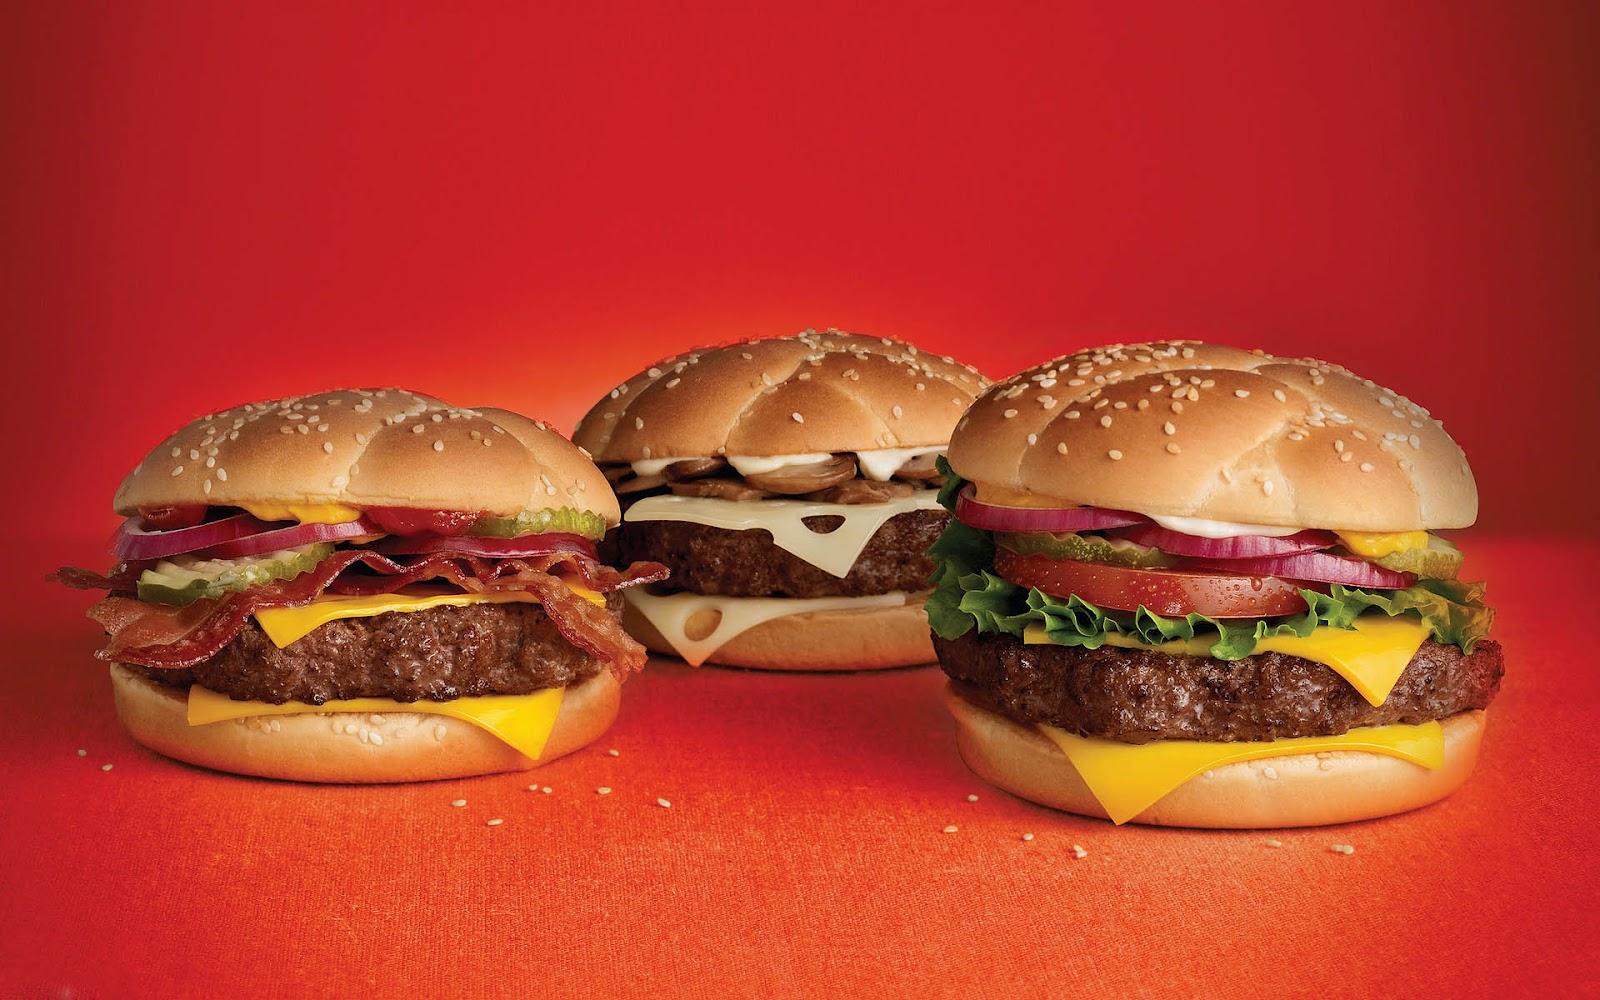 http://4.bp.blogspot.com/-SFltSoBI3sU/UEXJEzKZXdI/AAAAAAAAGA8/fliJnz0586E/s1600/hd-broodje-hamburger-achtergrond-met-broodjes-hamburgers-kaas-tomaat-ui-en-komkommer-hd-eten-wallpaper-foto.jpg